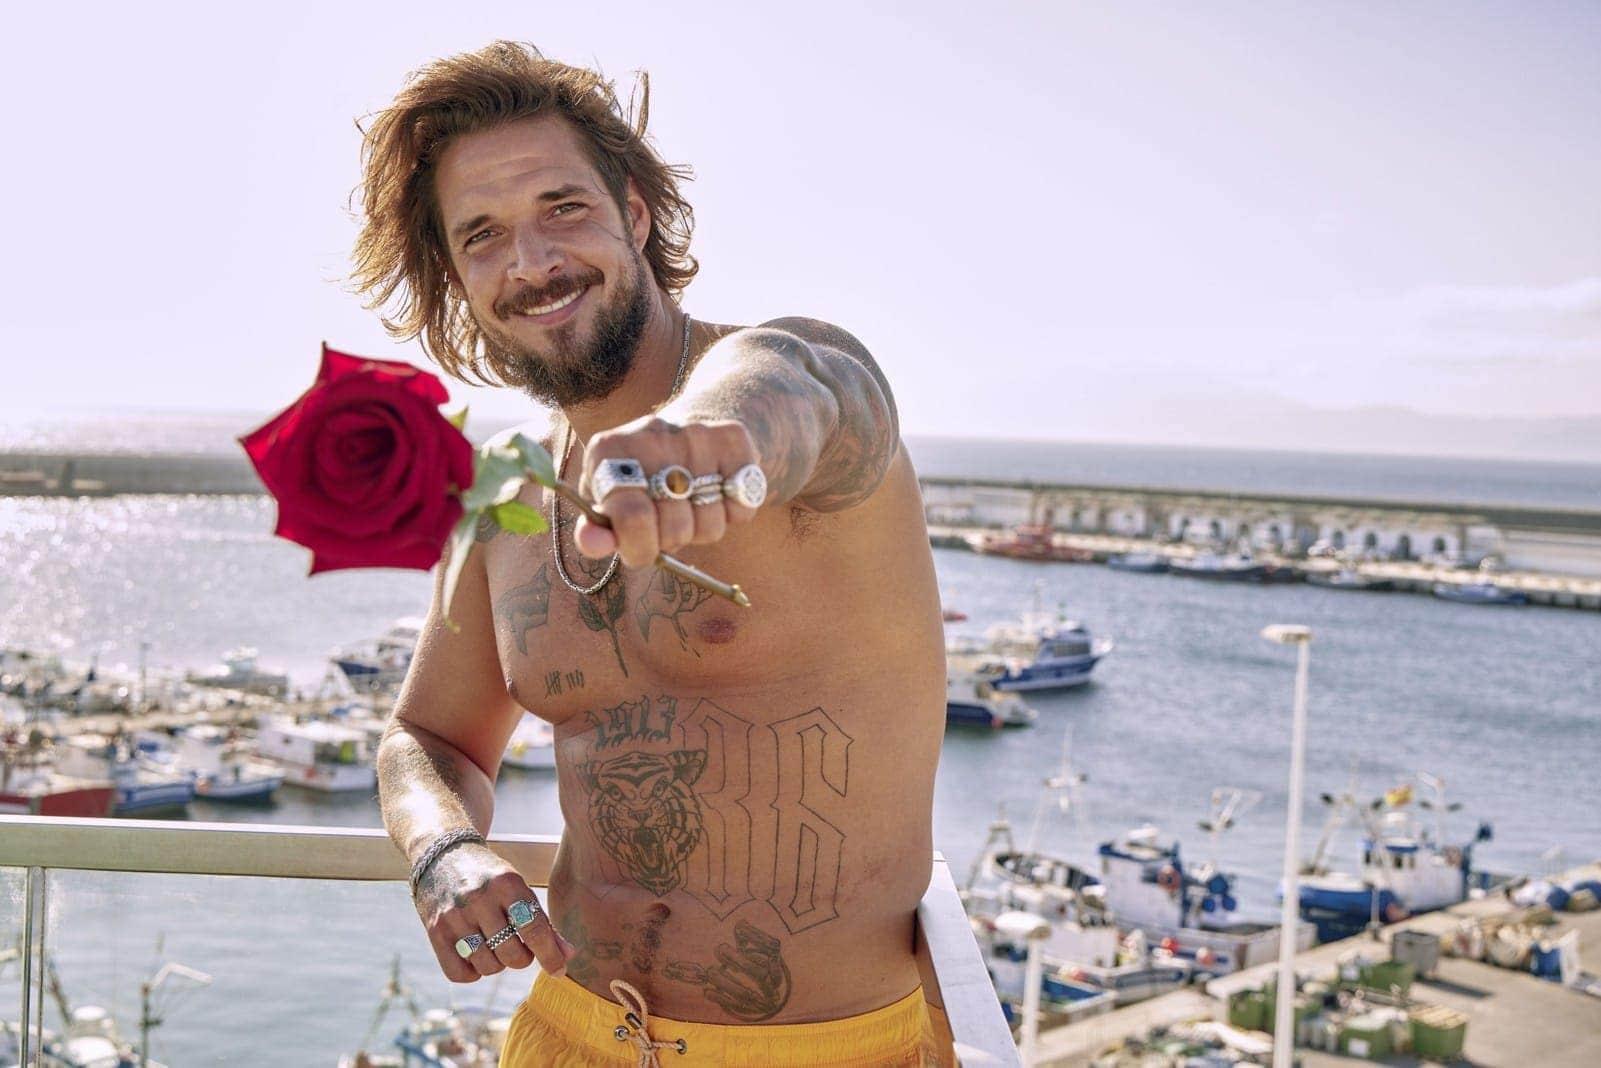 Zico Banach Bachelor in Paradise 2021